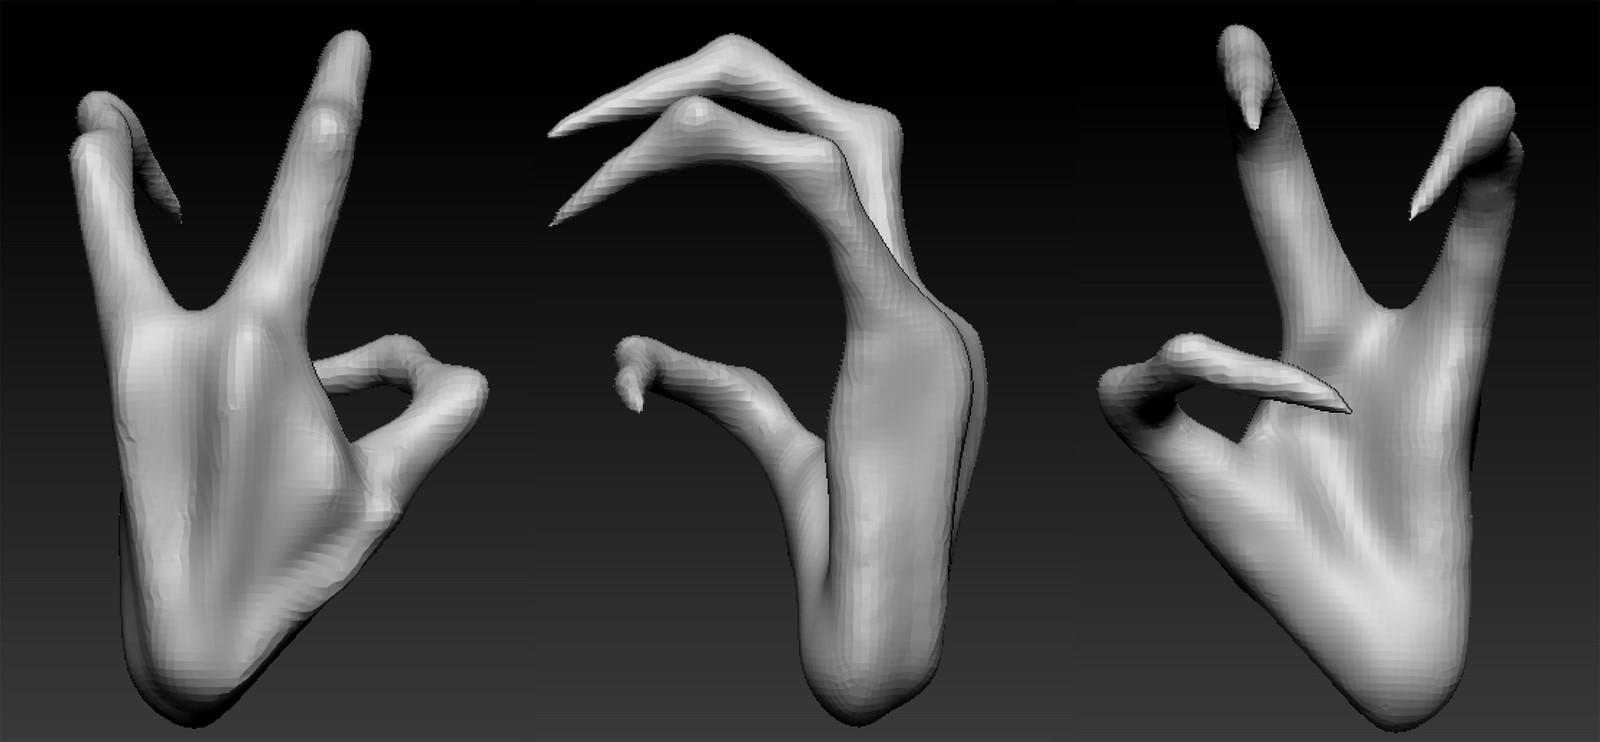 Creature Hand